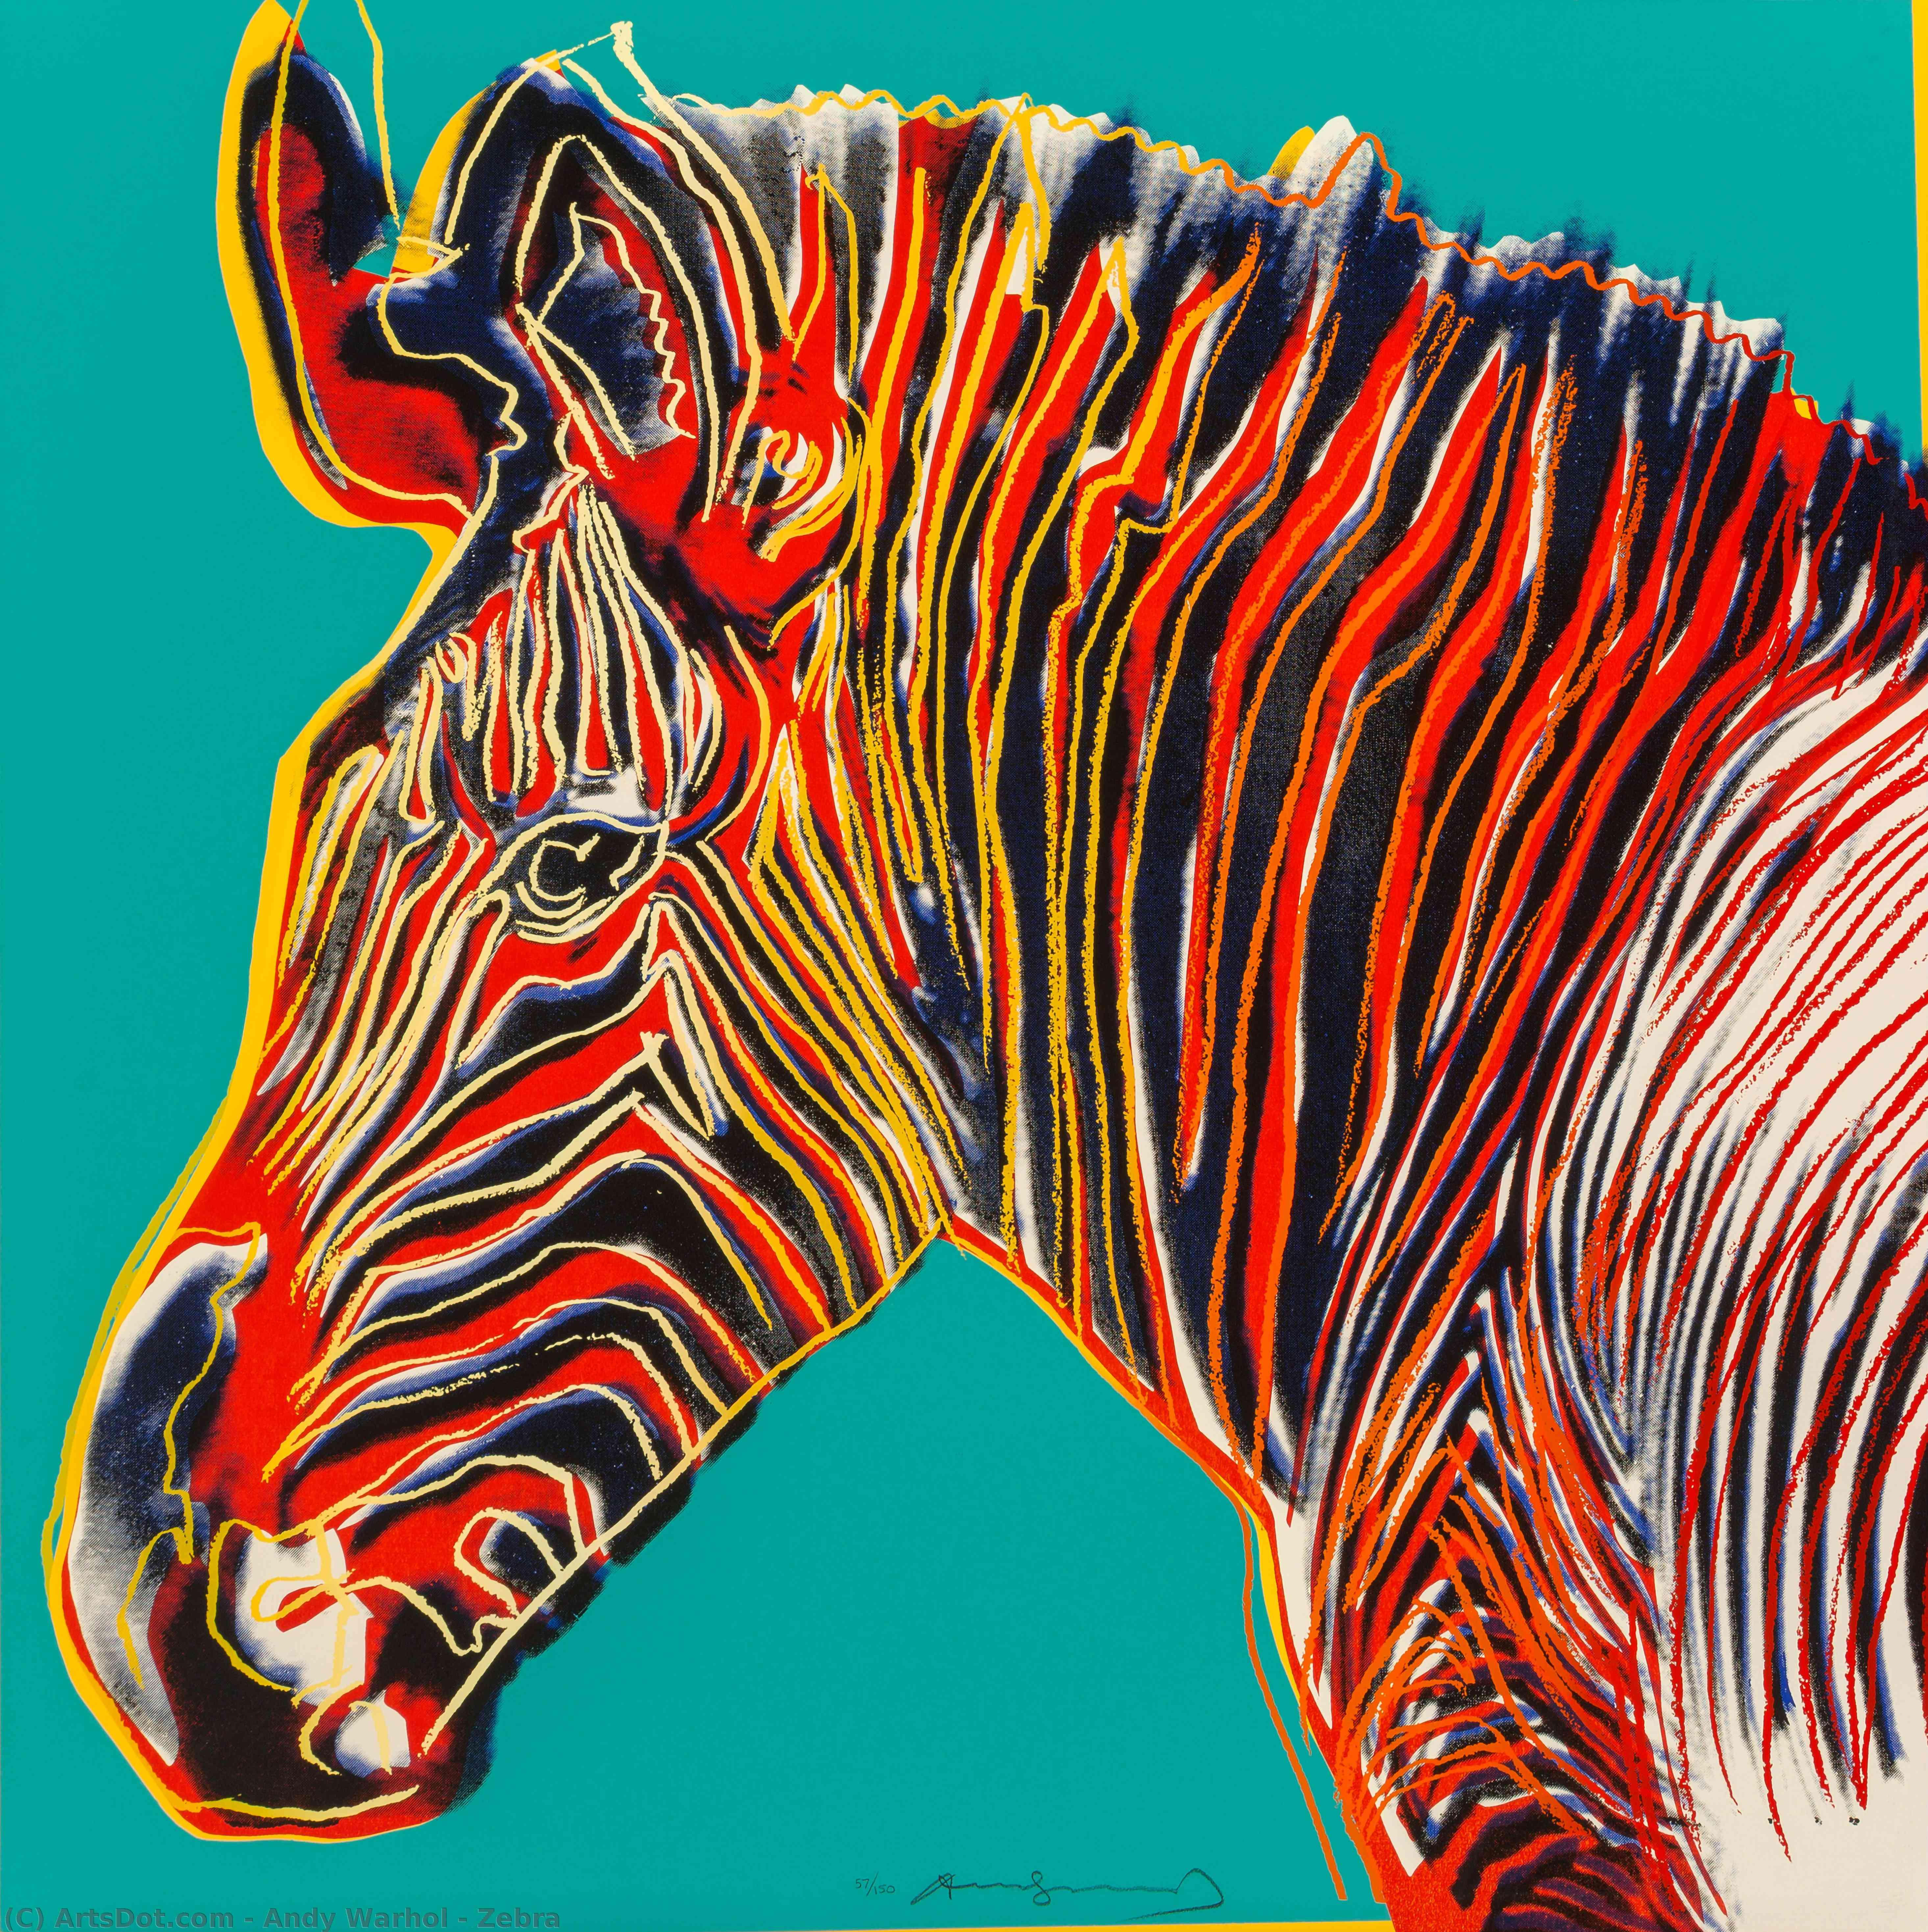 andy warhol artwork - HD5862×5874